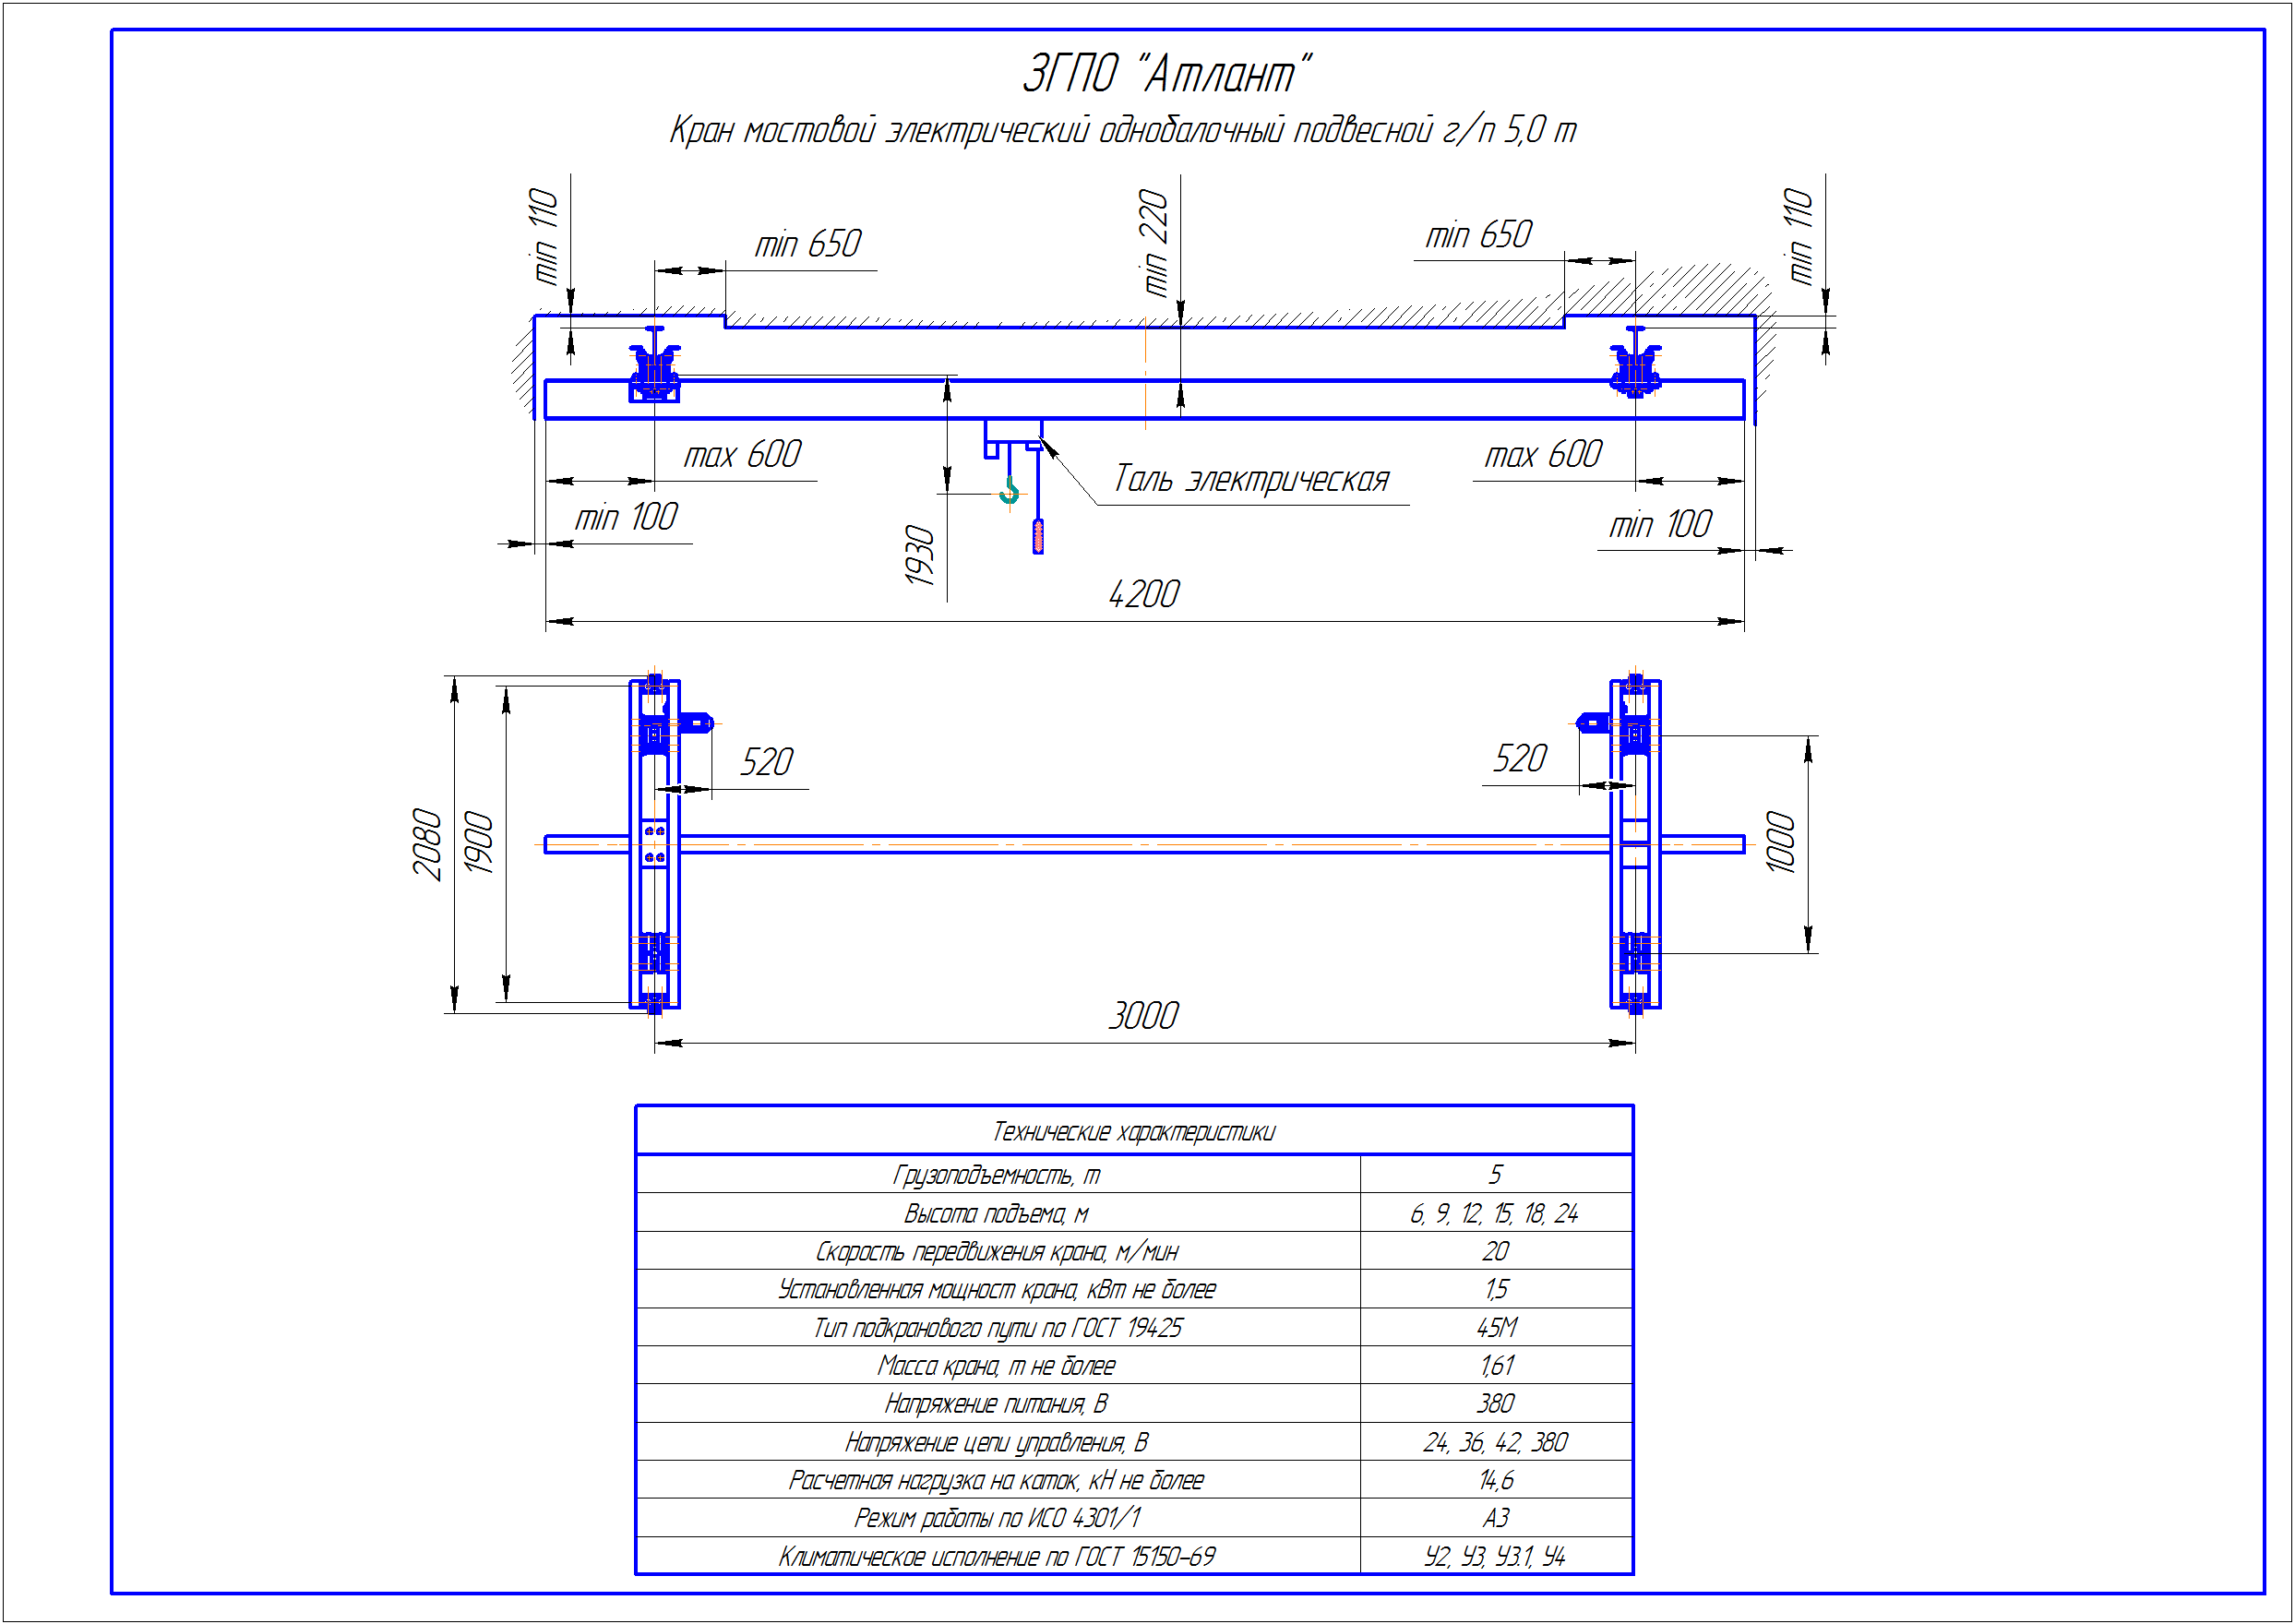 KBP 4 1 - Подвесная кран балка